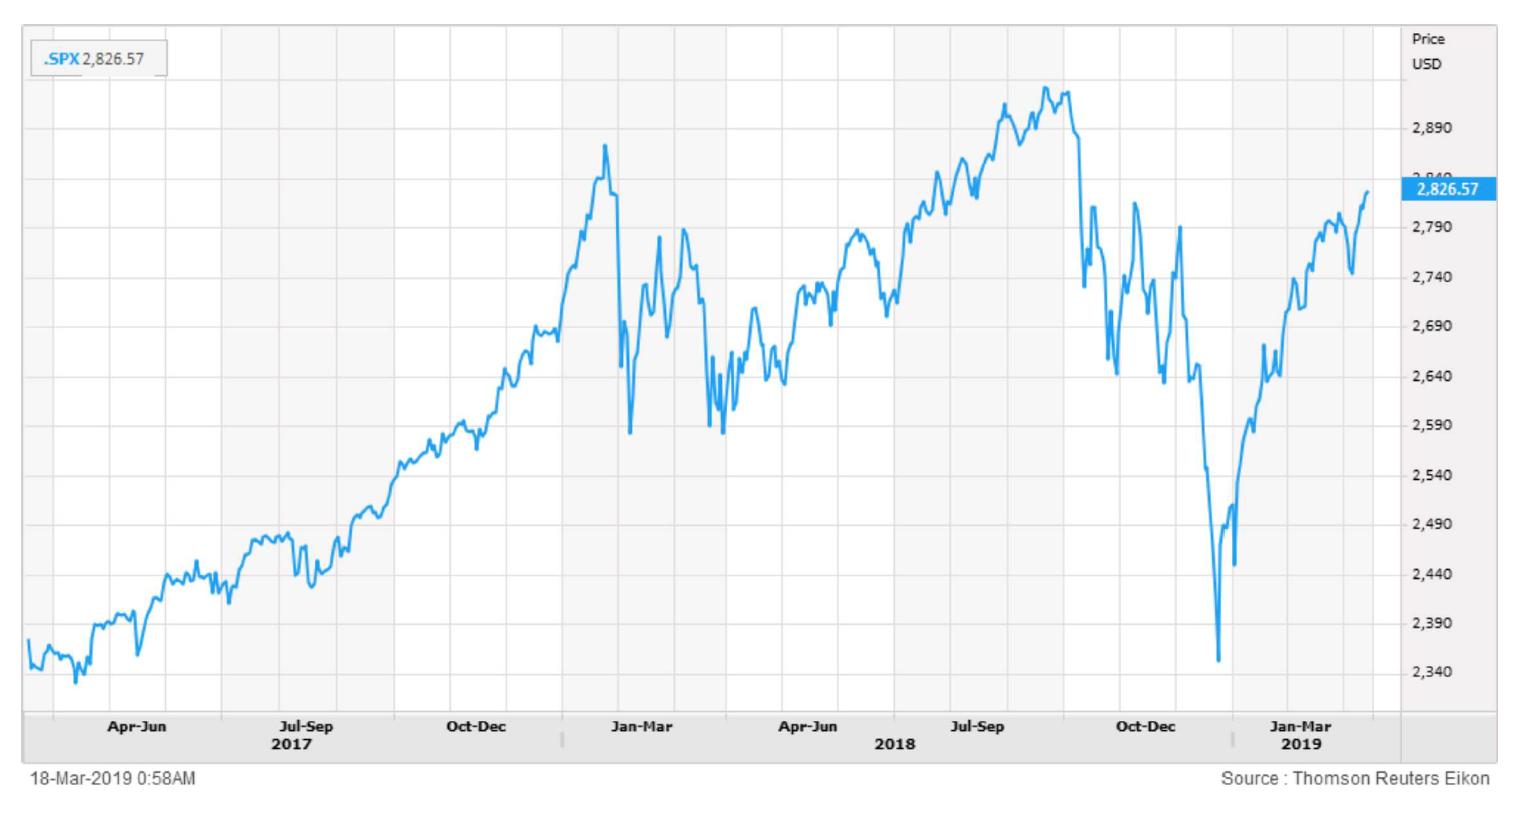 Stock Roller Coaster 2017-2019